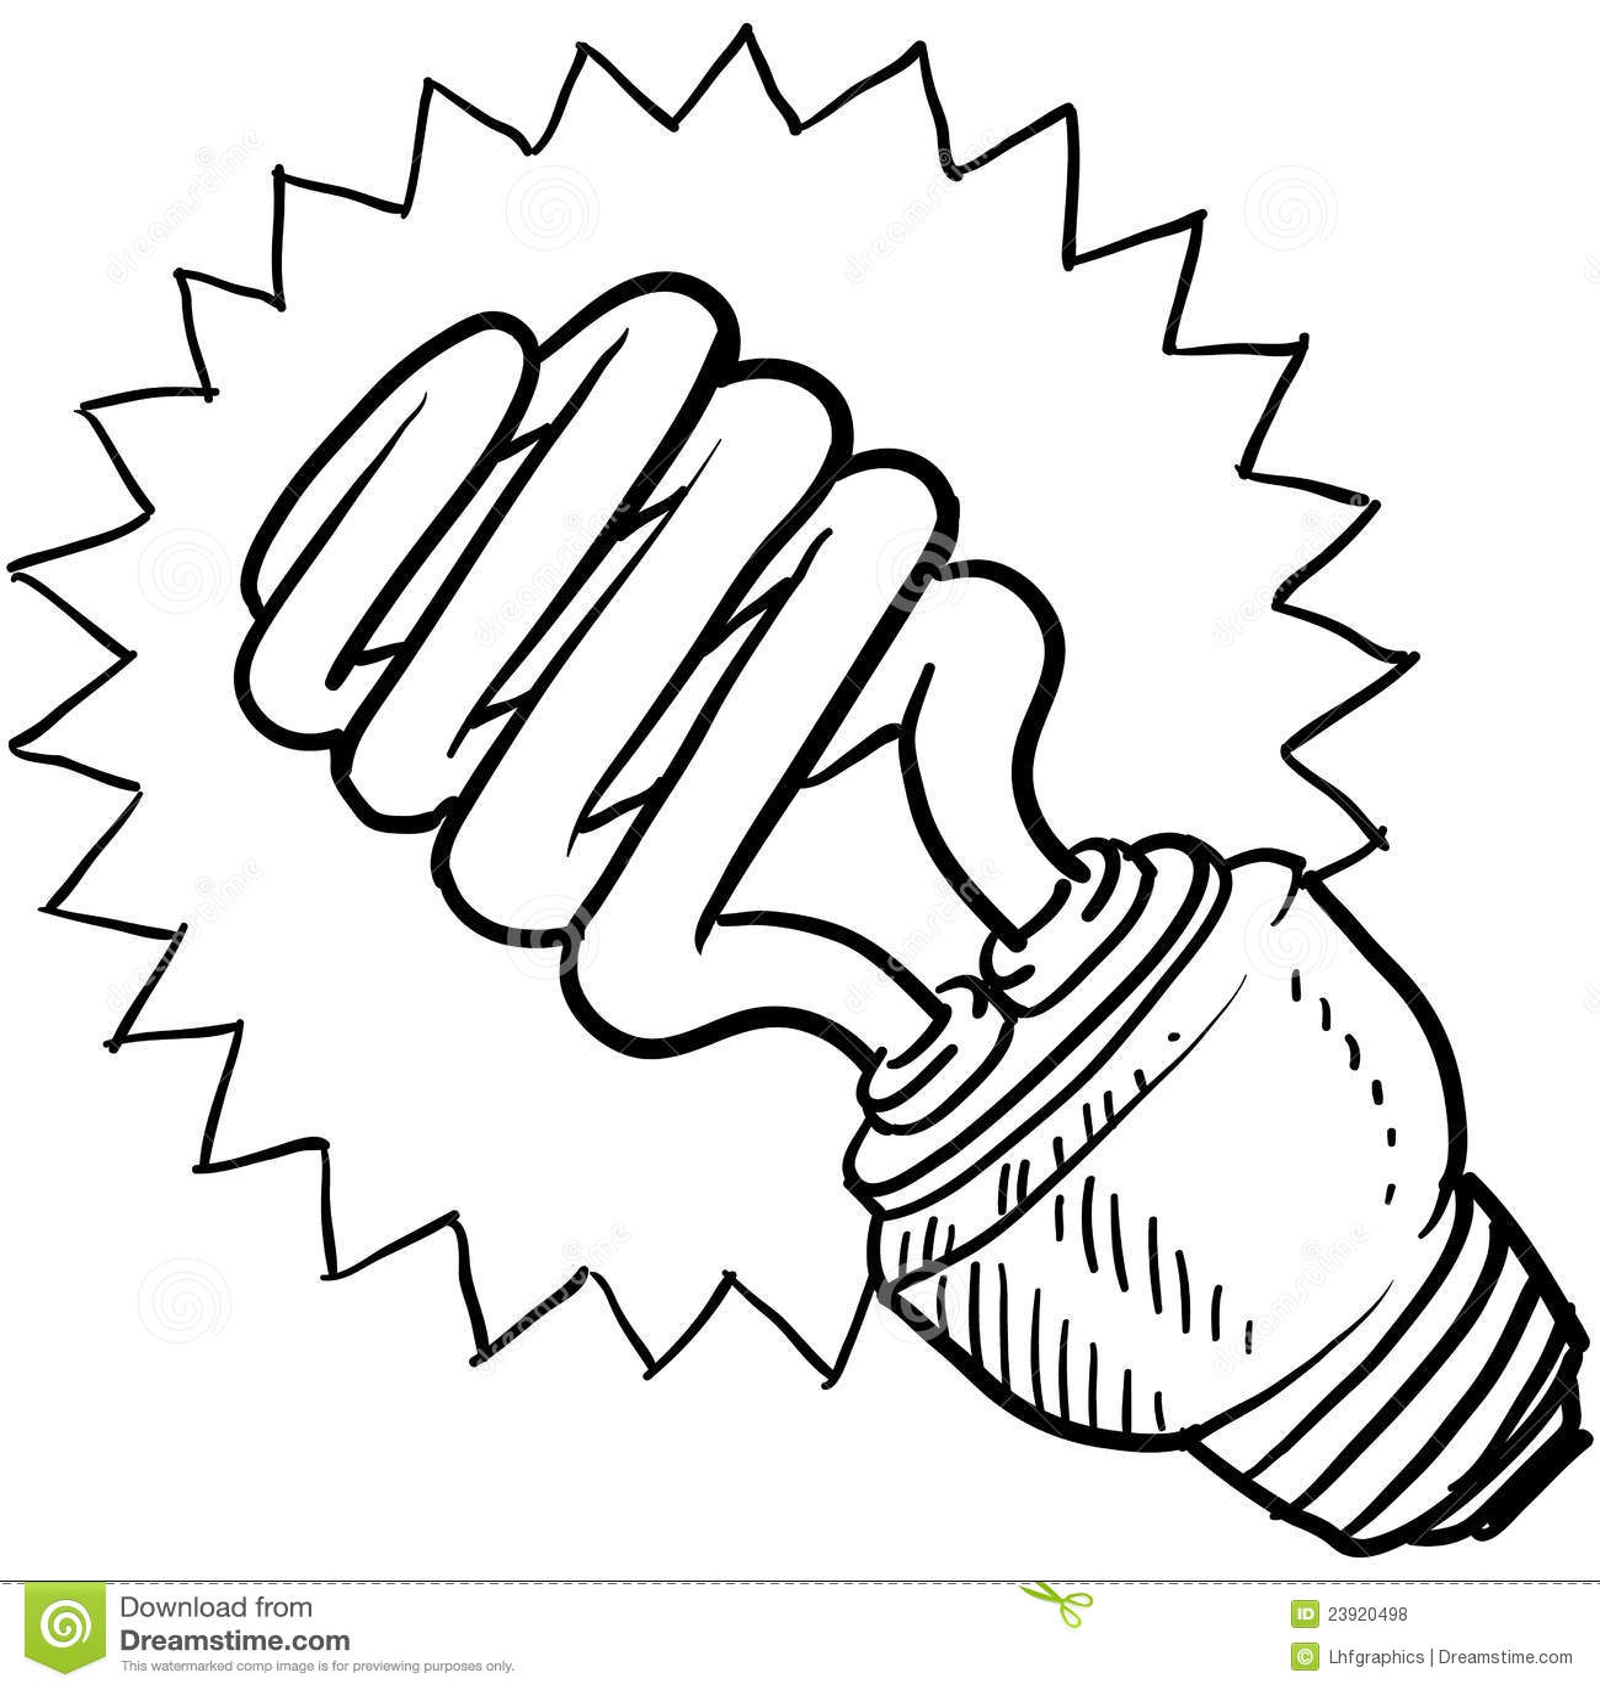 compact fluorescent light bulb sketch stock vector